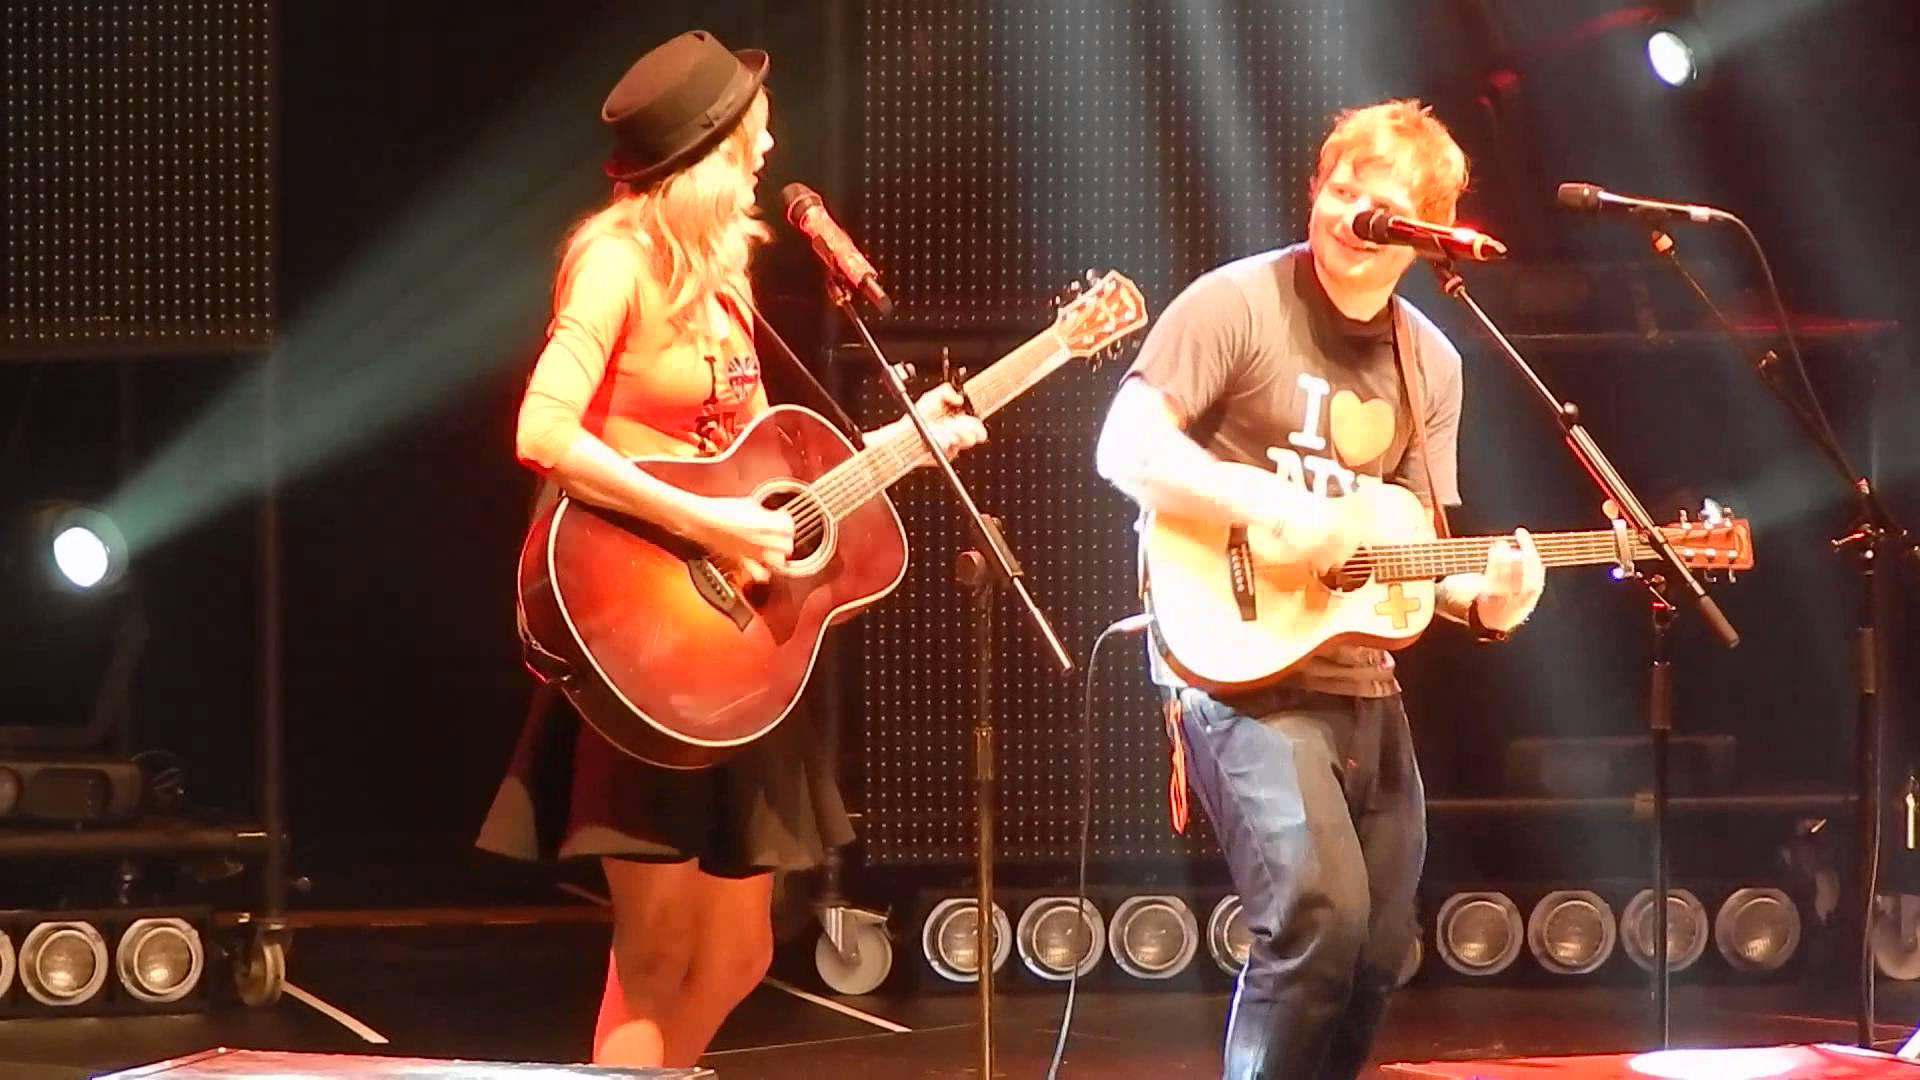 Taylor Swift praises pal Ed Sheeran in heartfelt essay honoring his Time 100 ranking